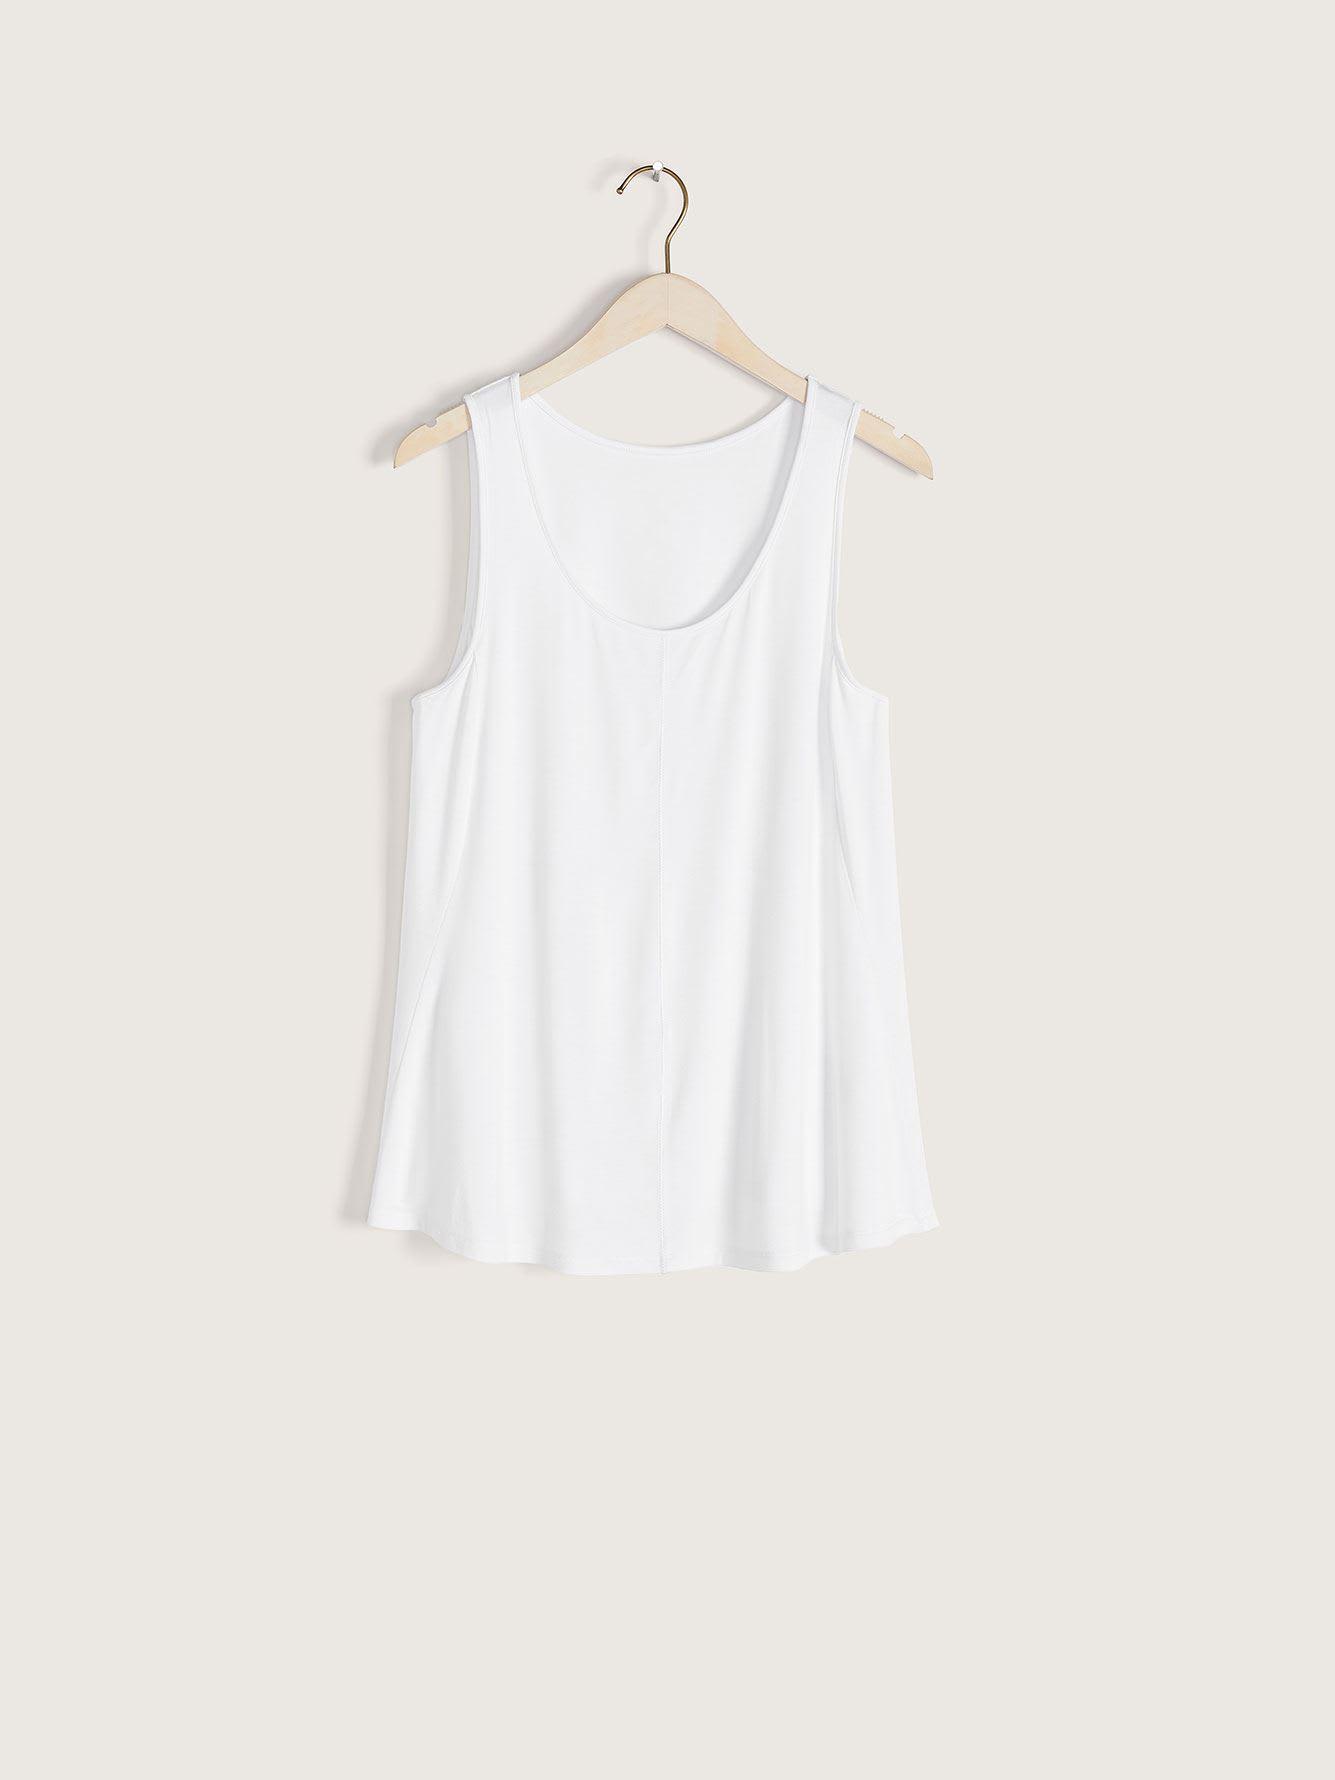 White Scoop-Neck Swing Tank - Addition Elle